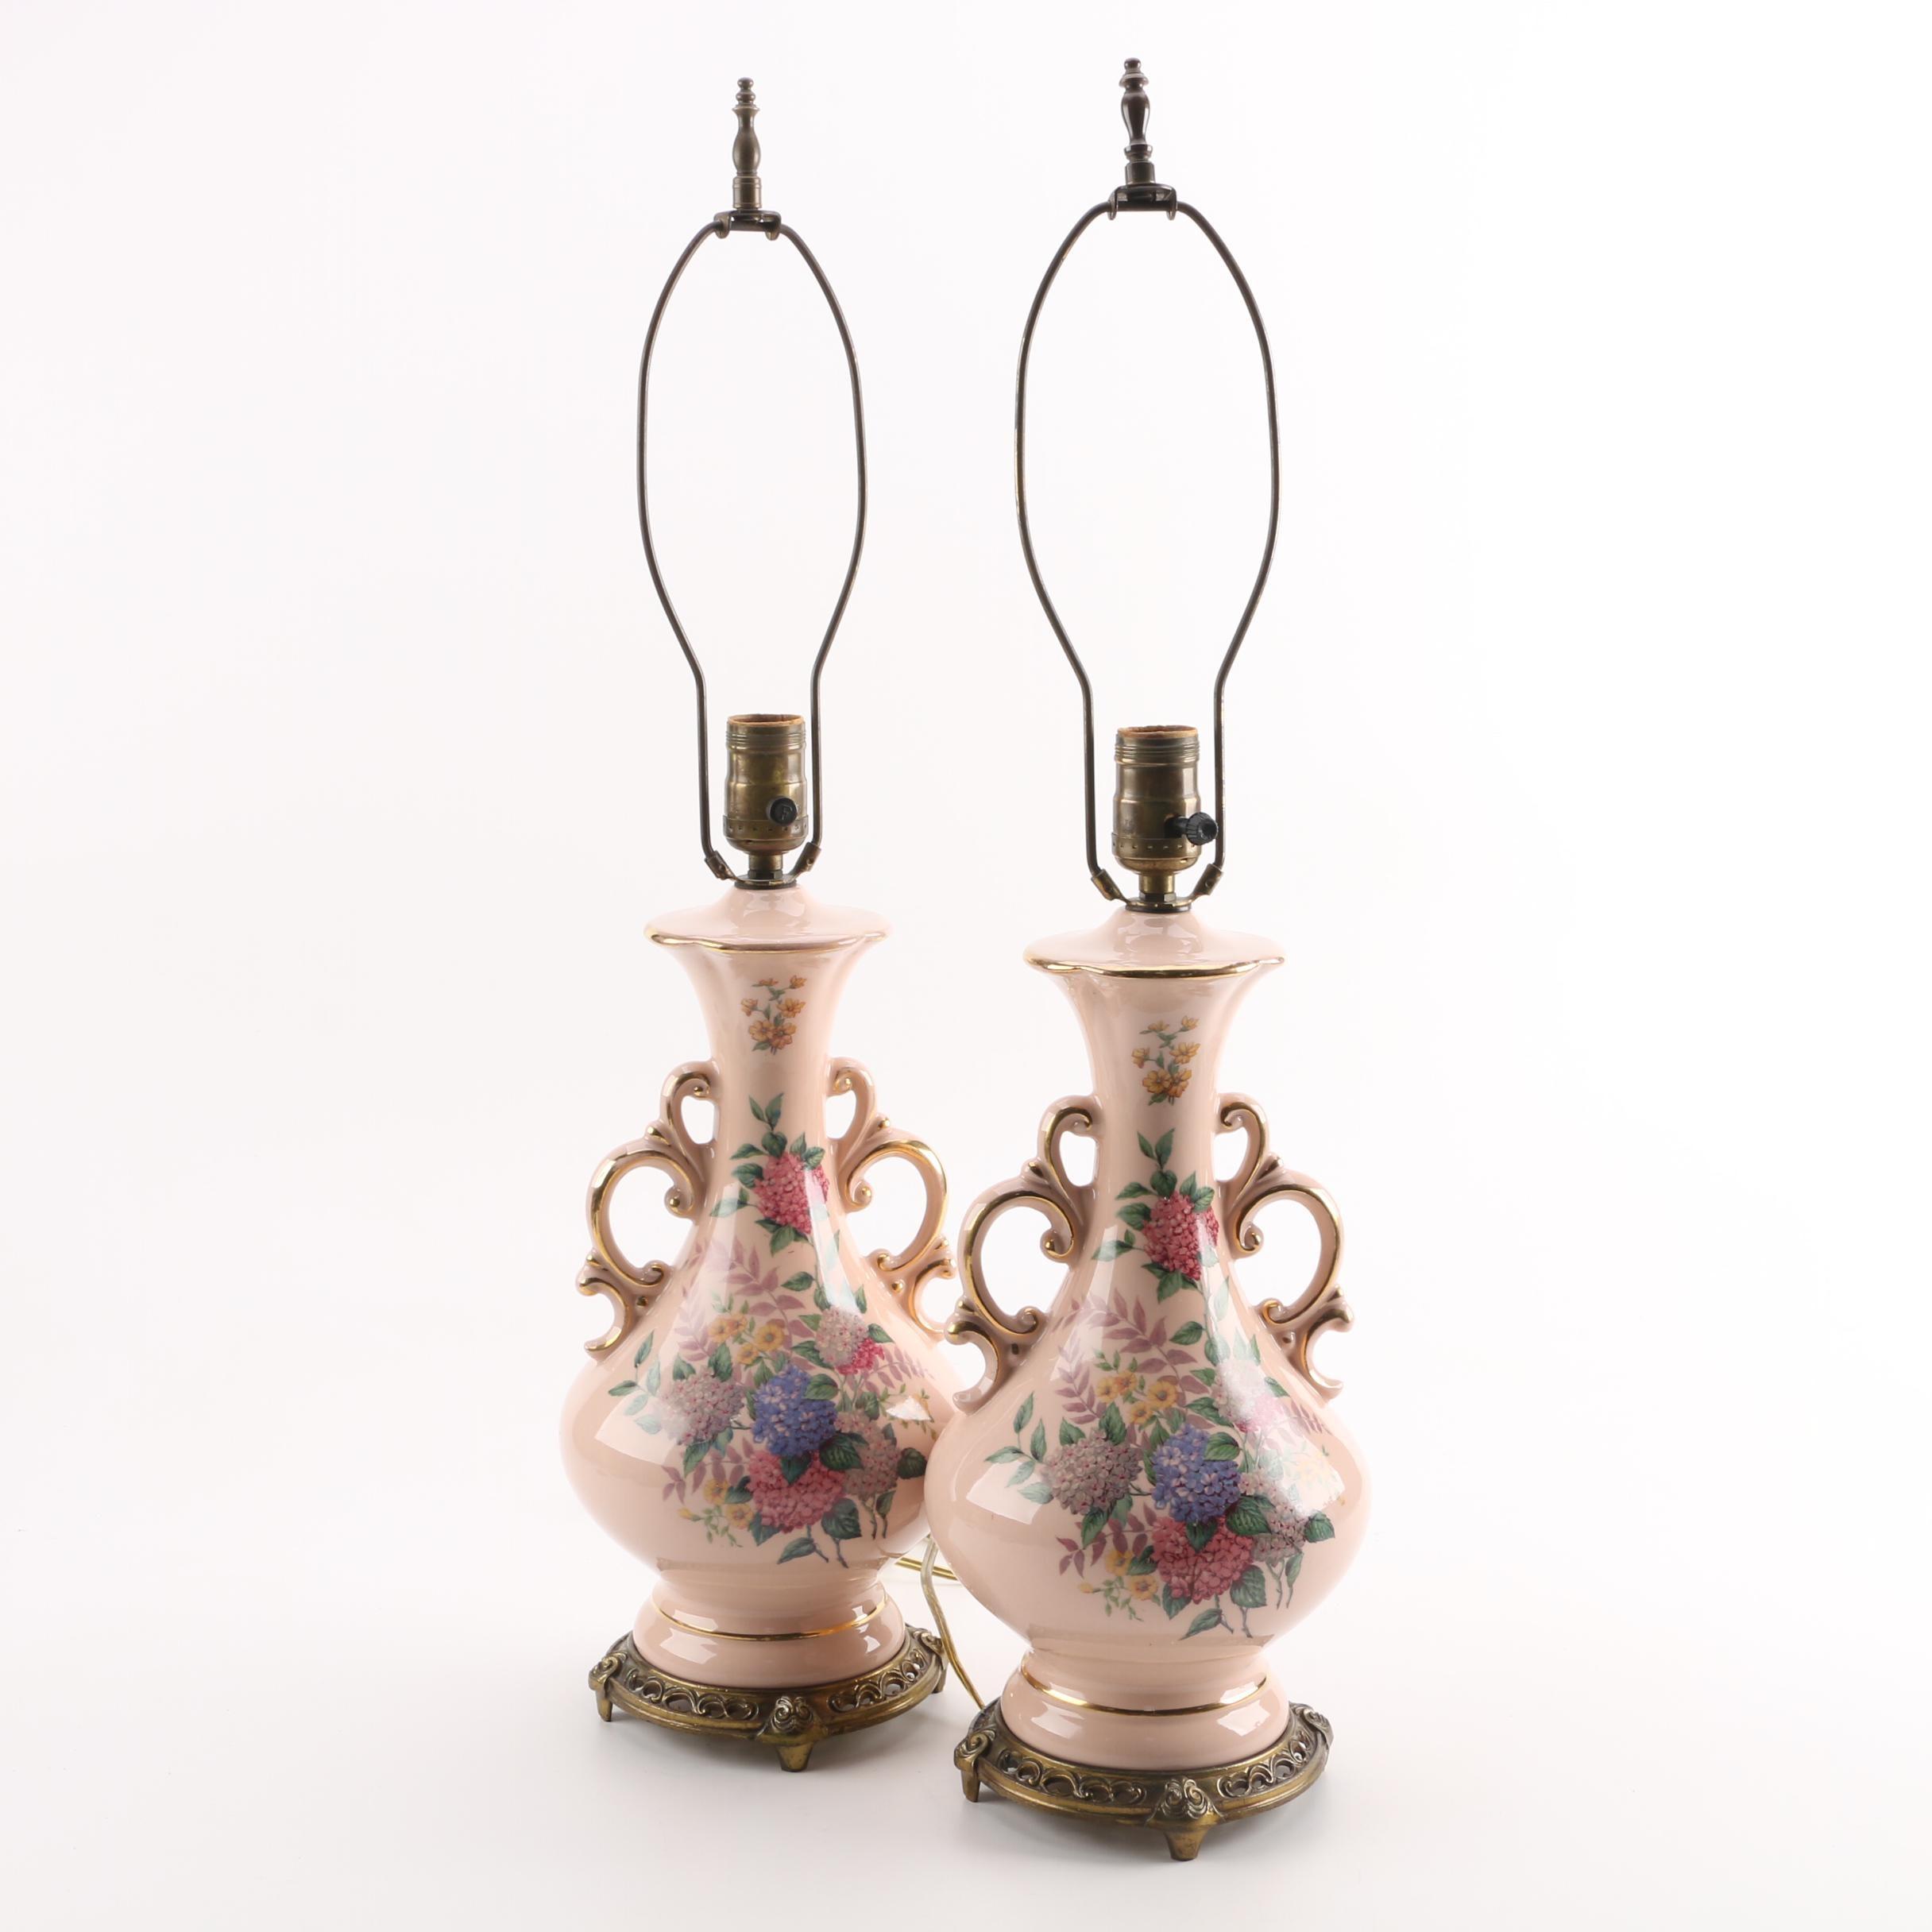 Pair Of Vintage Porcelain Table Lamps